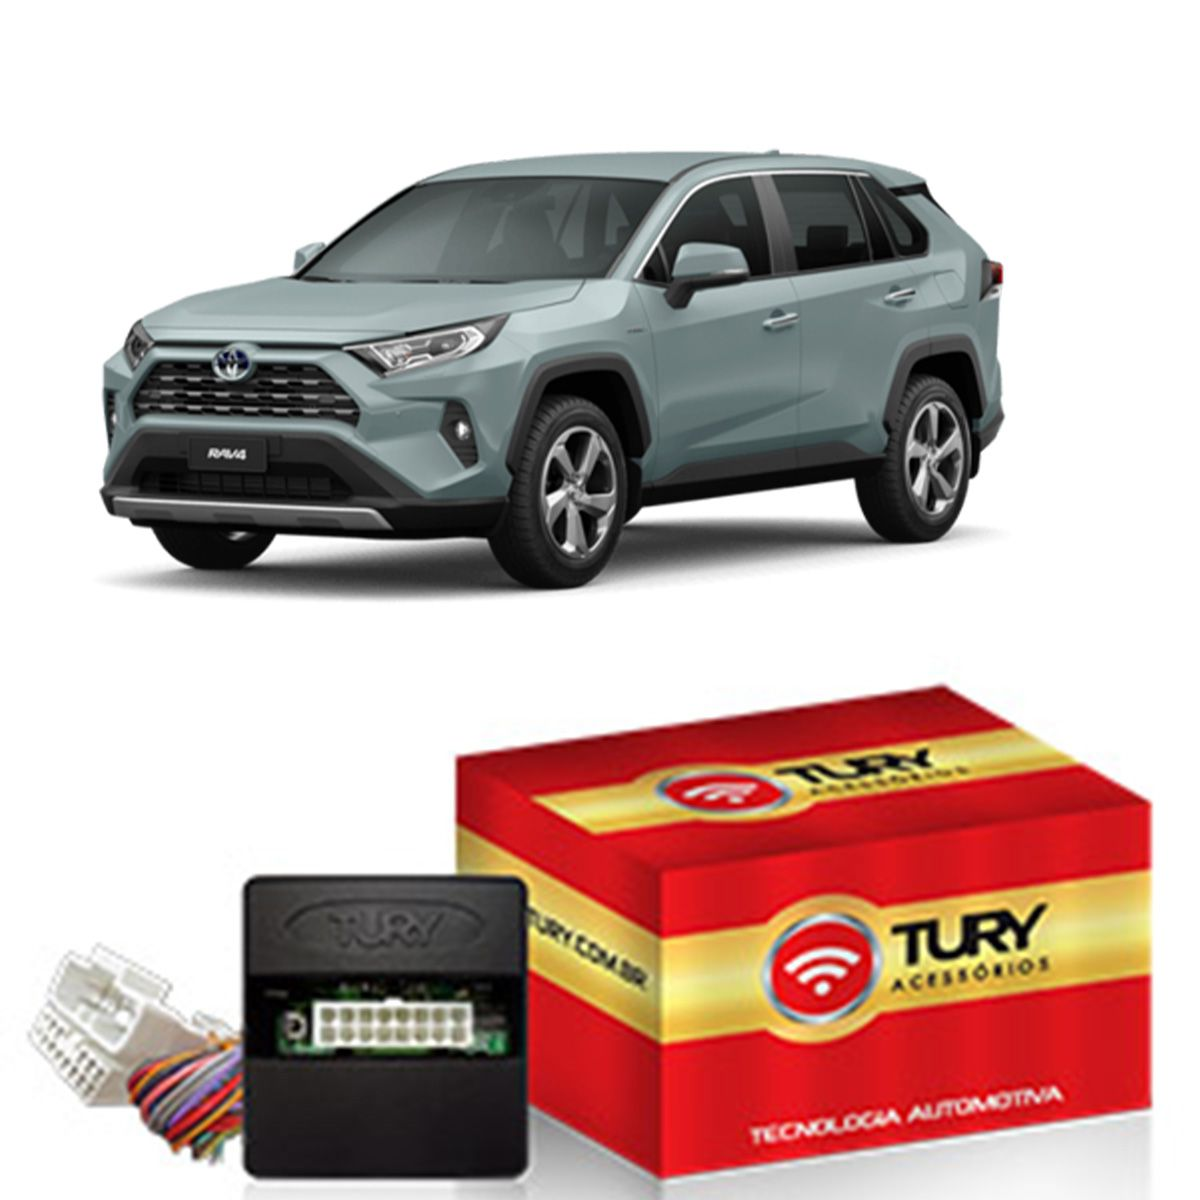 Módulo Rebatimento Retrovisor Elétrico Toyota RAV4 2020 Tilt Down Plug & Play Tury PARK 6.9.7 DK